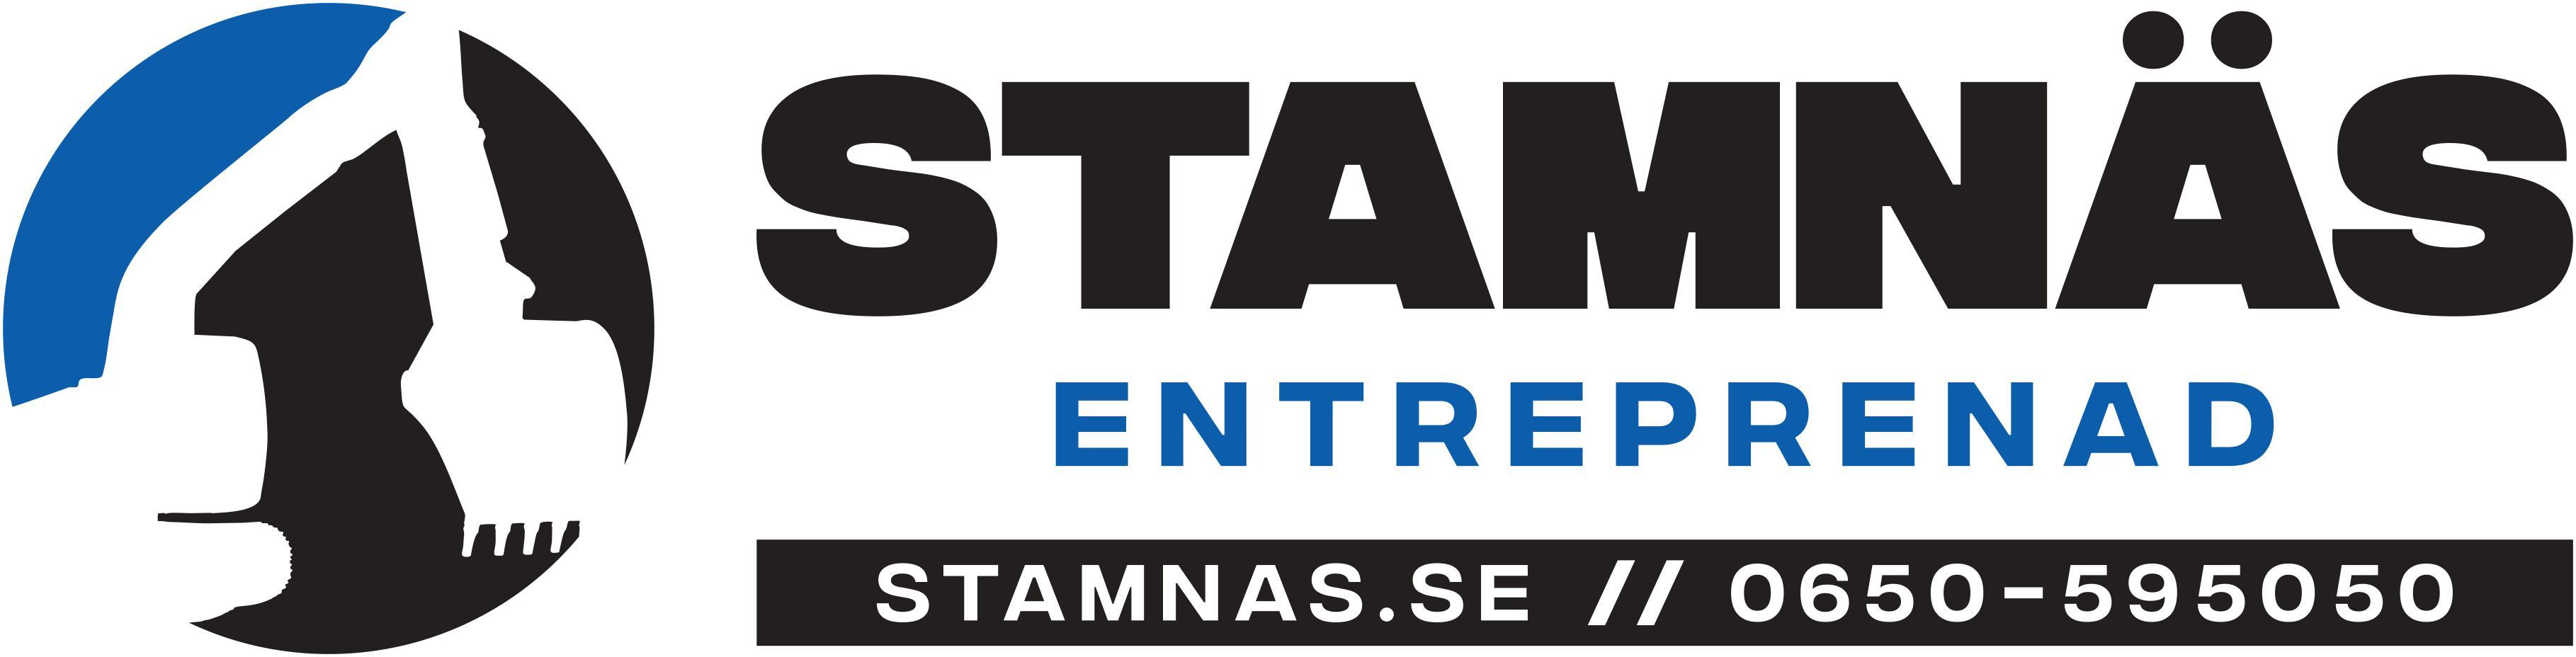 logotyp Stamnäs Entreprenad